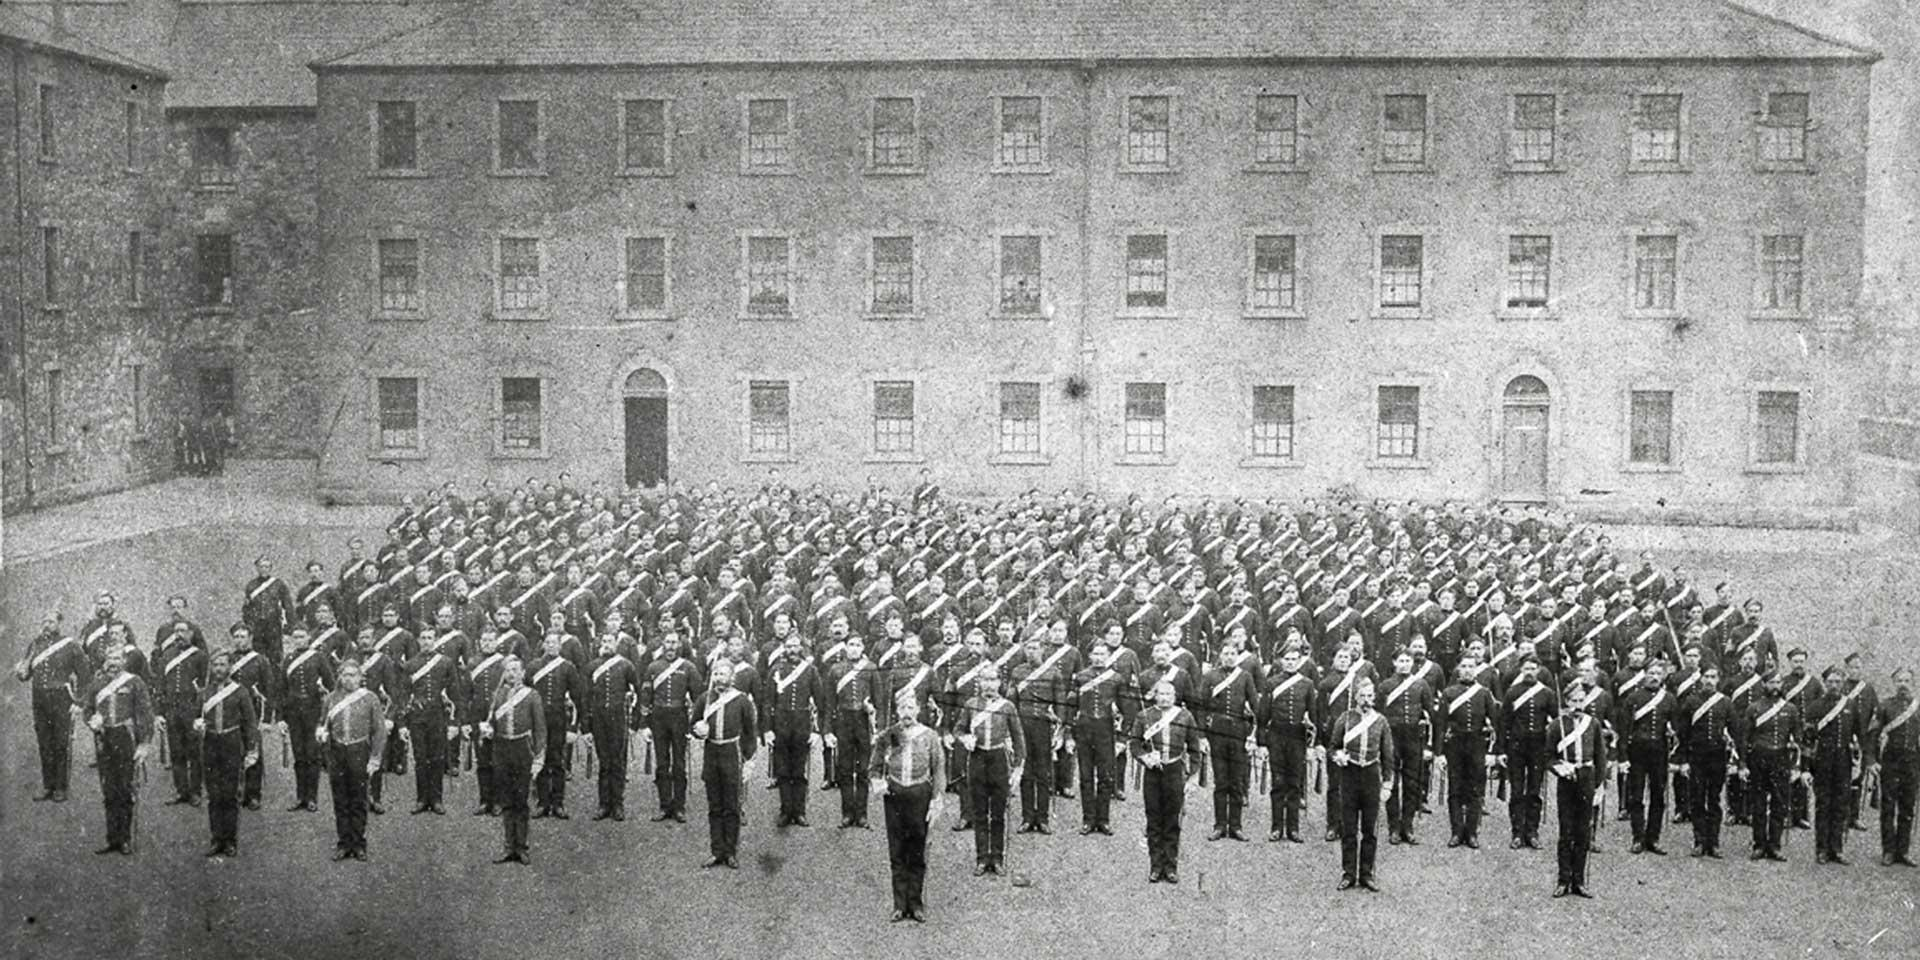 6th (Inniskilling) Dragoons drawn up for dismounted parade at the Royal Barracks, Dublin, 1875